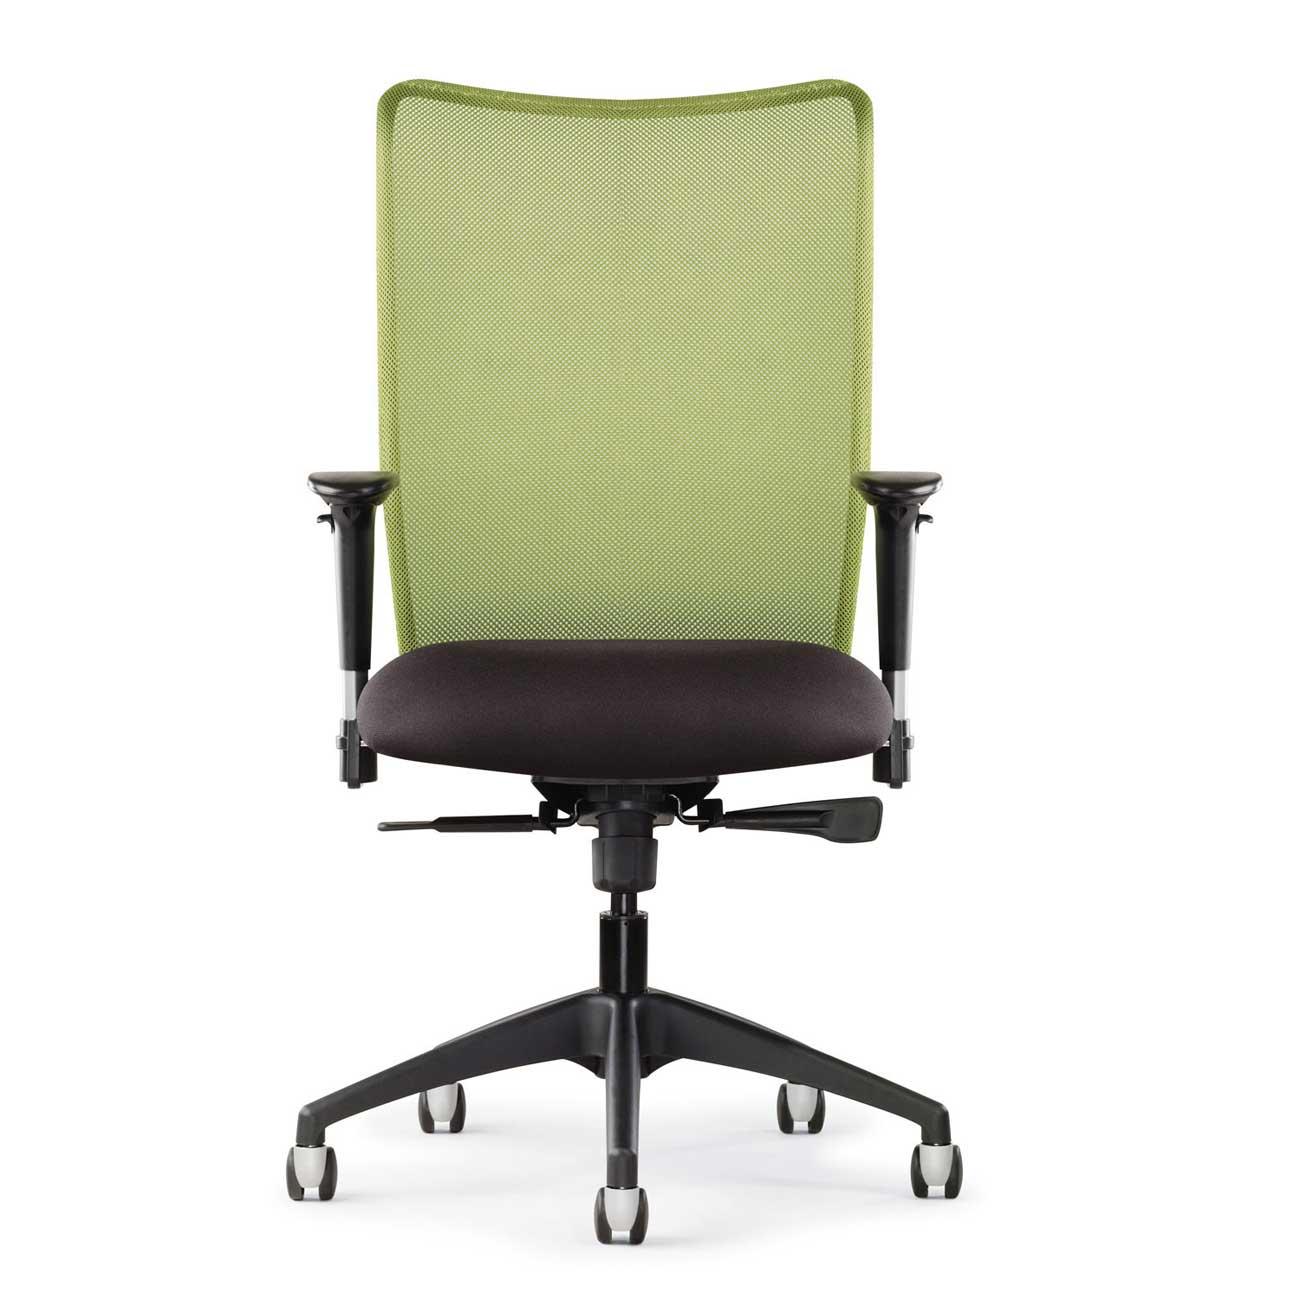 Inertia Green Highback Mesh Executive Office Chair